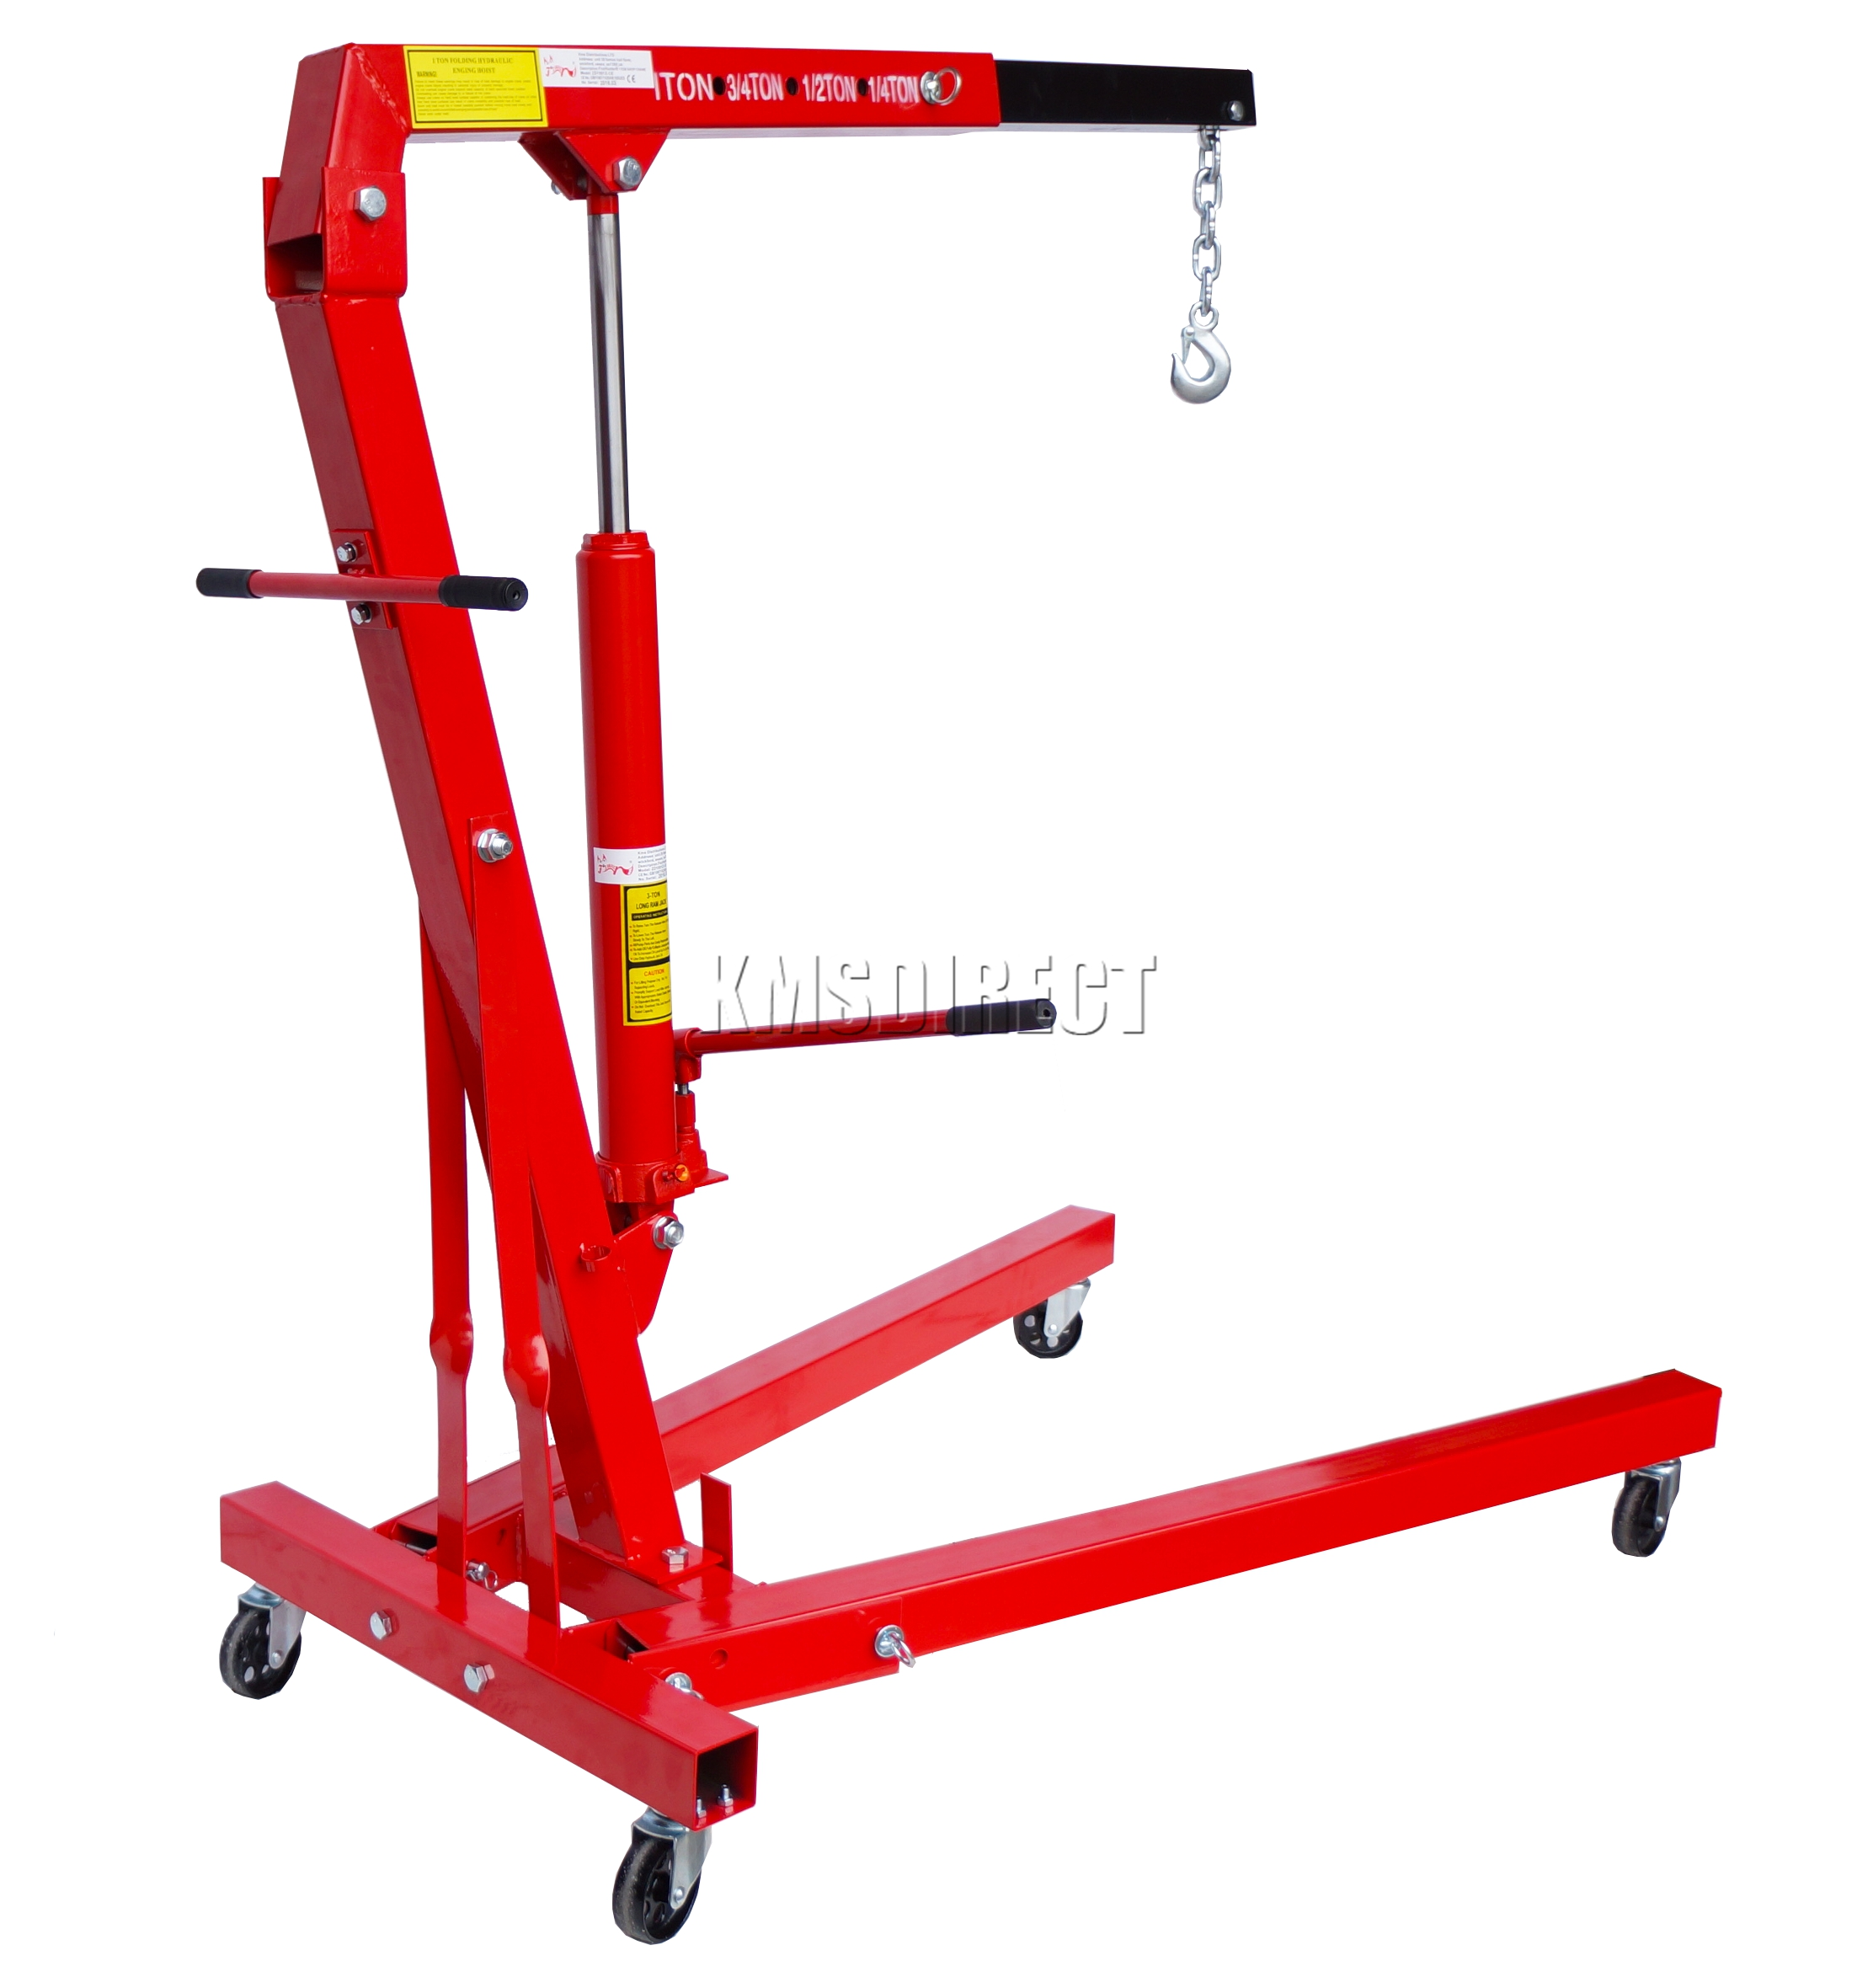 Folding Jack Stands >> FoxHunter Red 1 Ton Tonne Hydraulic Folding Engine Crane Stand Hoist lift Jack